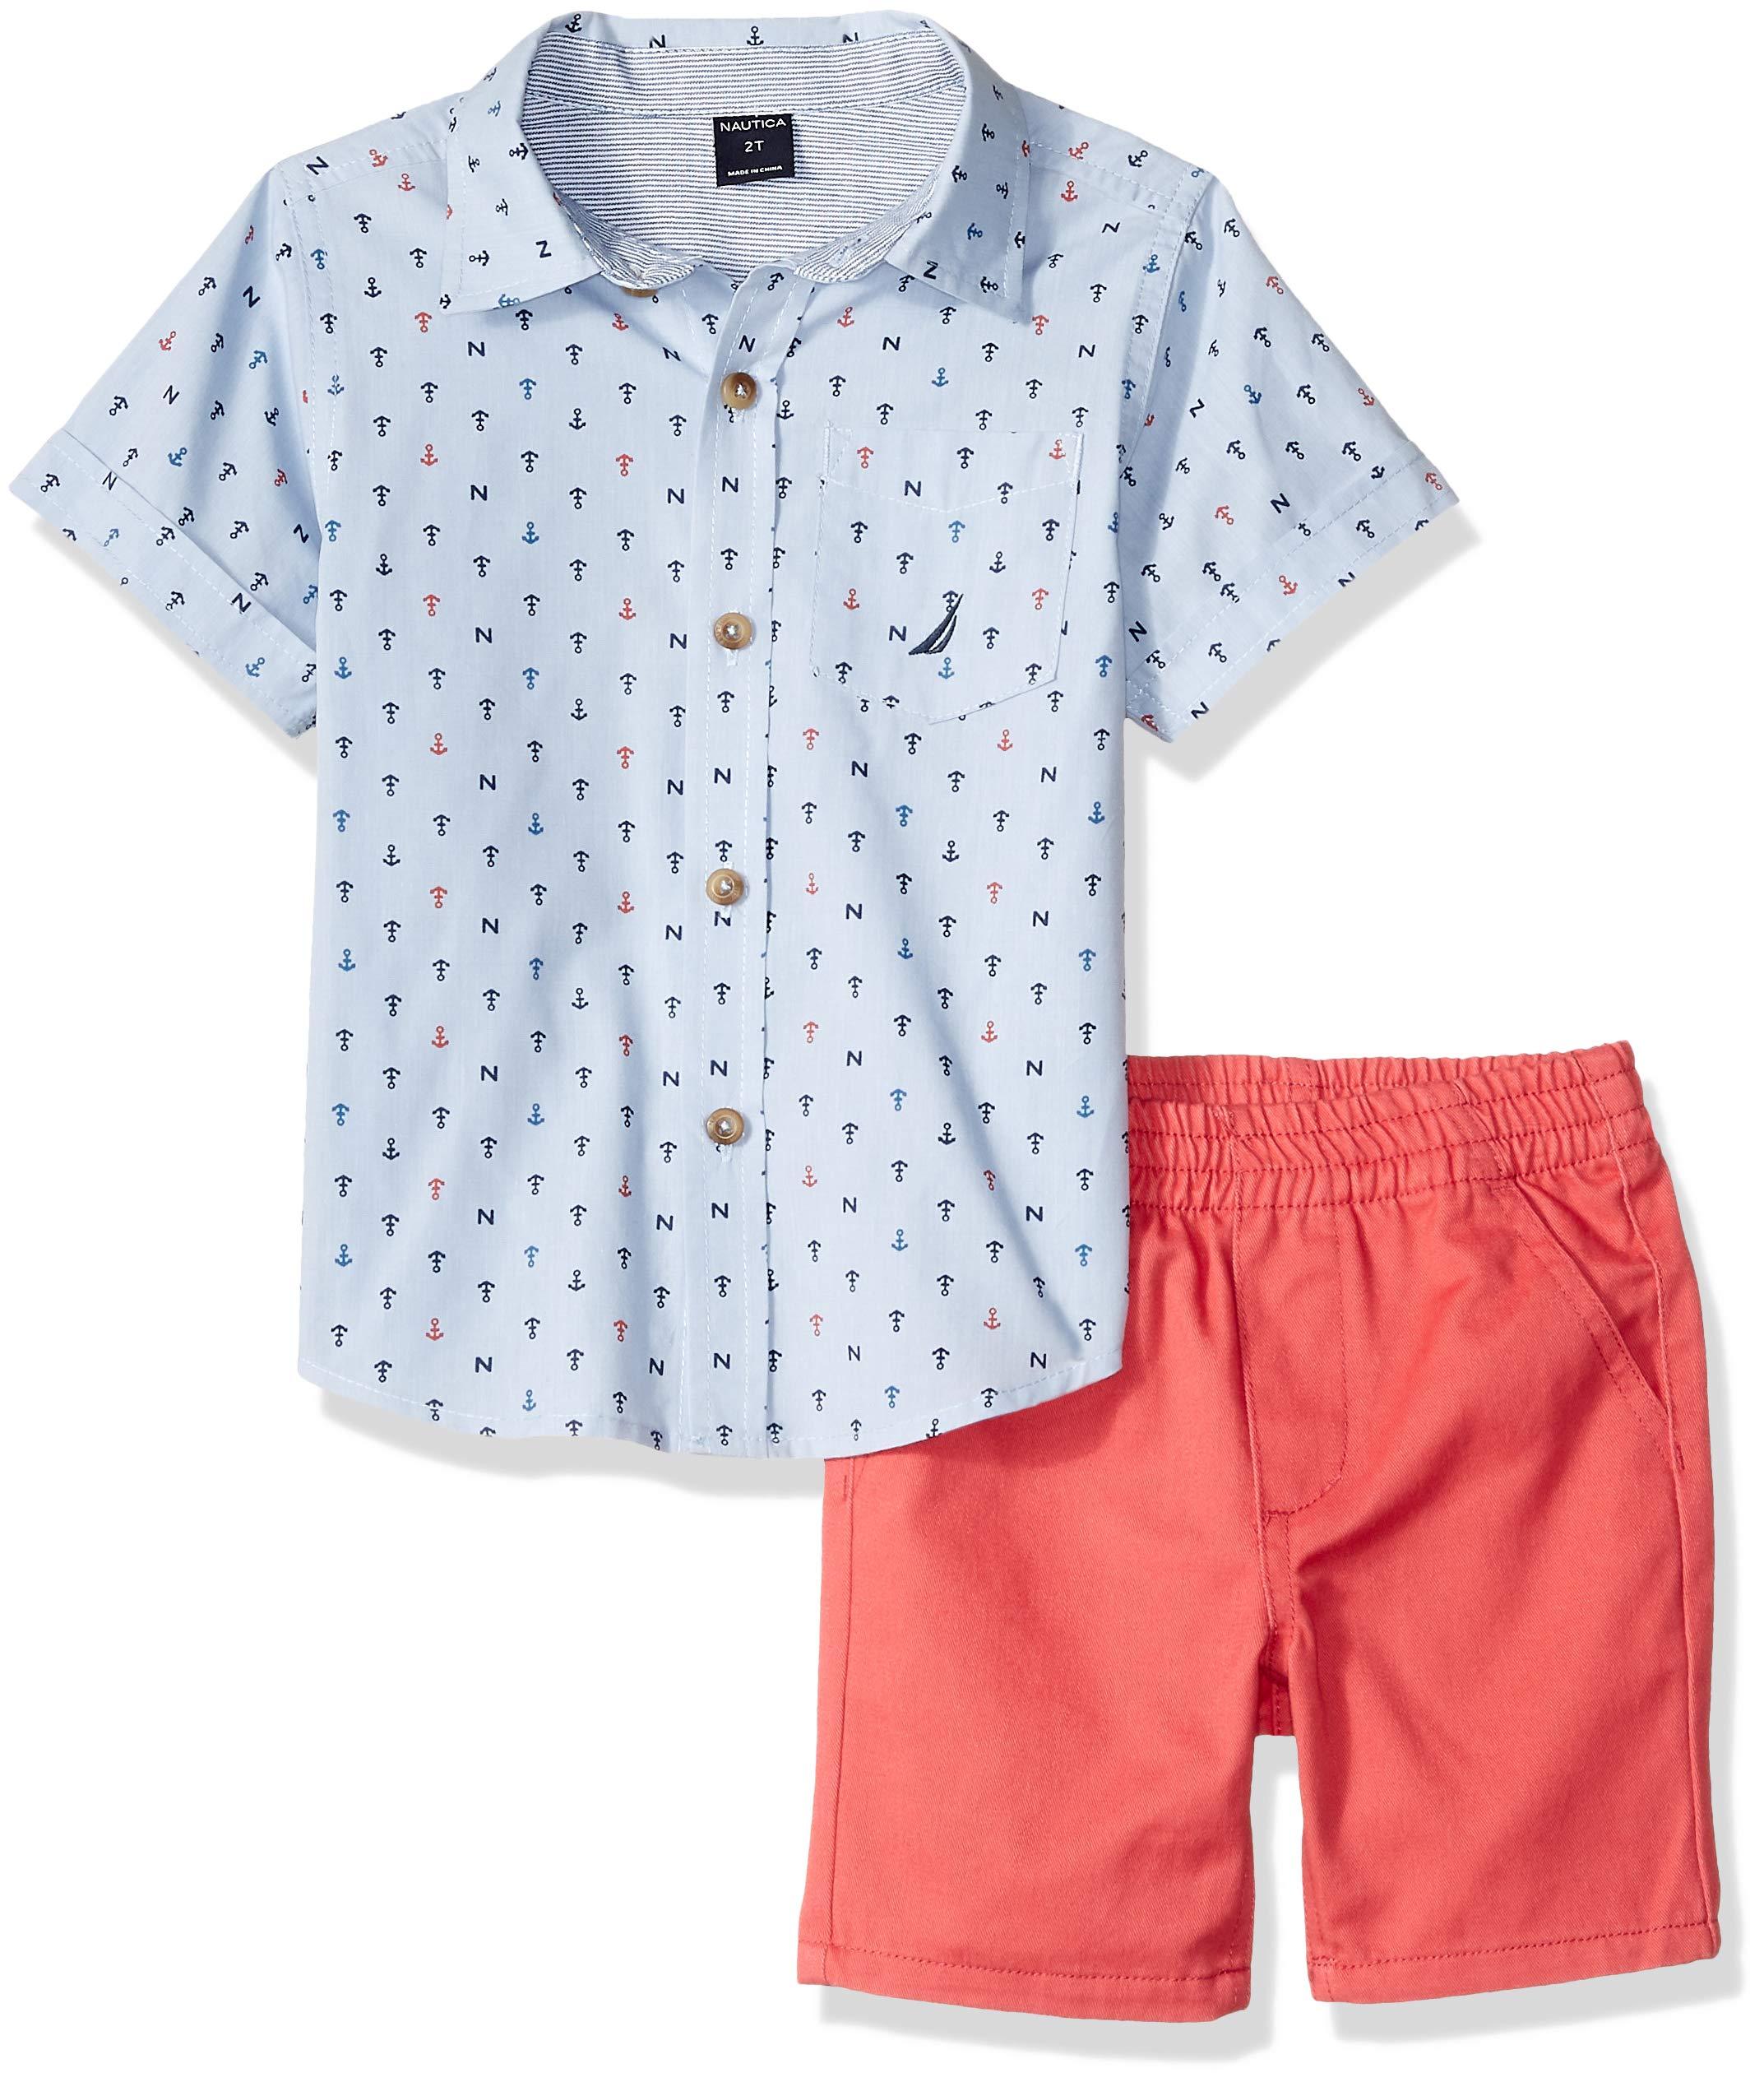 Nautica Sets (KHQ) Boys' Little 2 Pieces Shirt Shorts Set, Blue/Print, 5